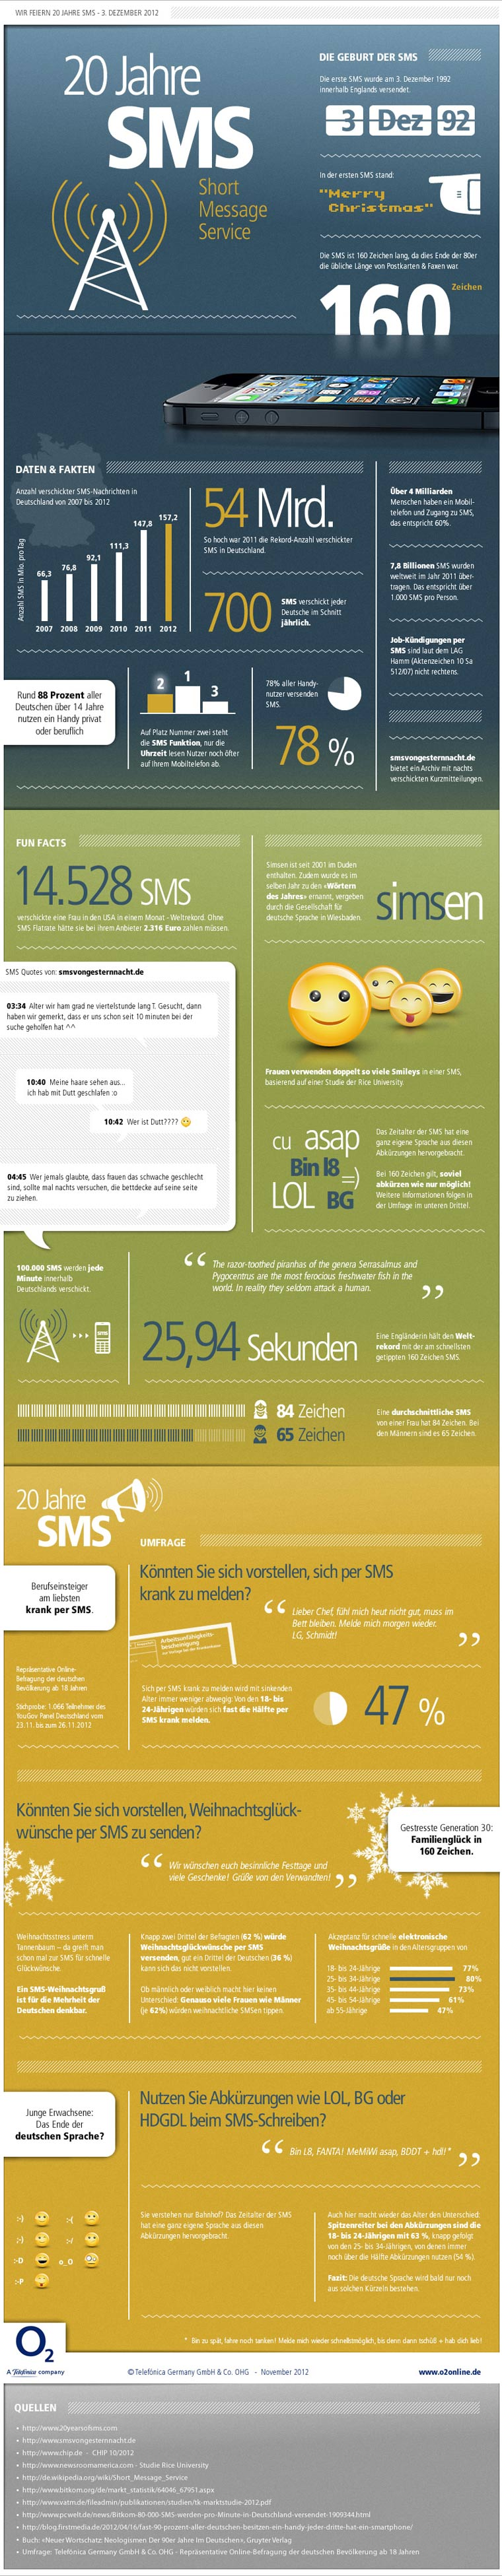 Infografik: 20 Jahre SMS infografik_20_jahre_SMS_02